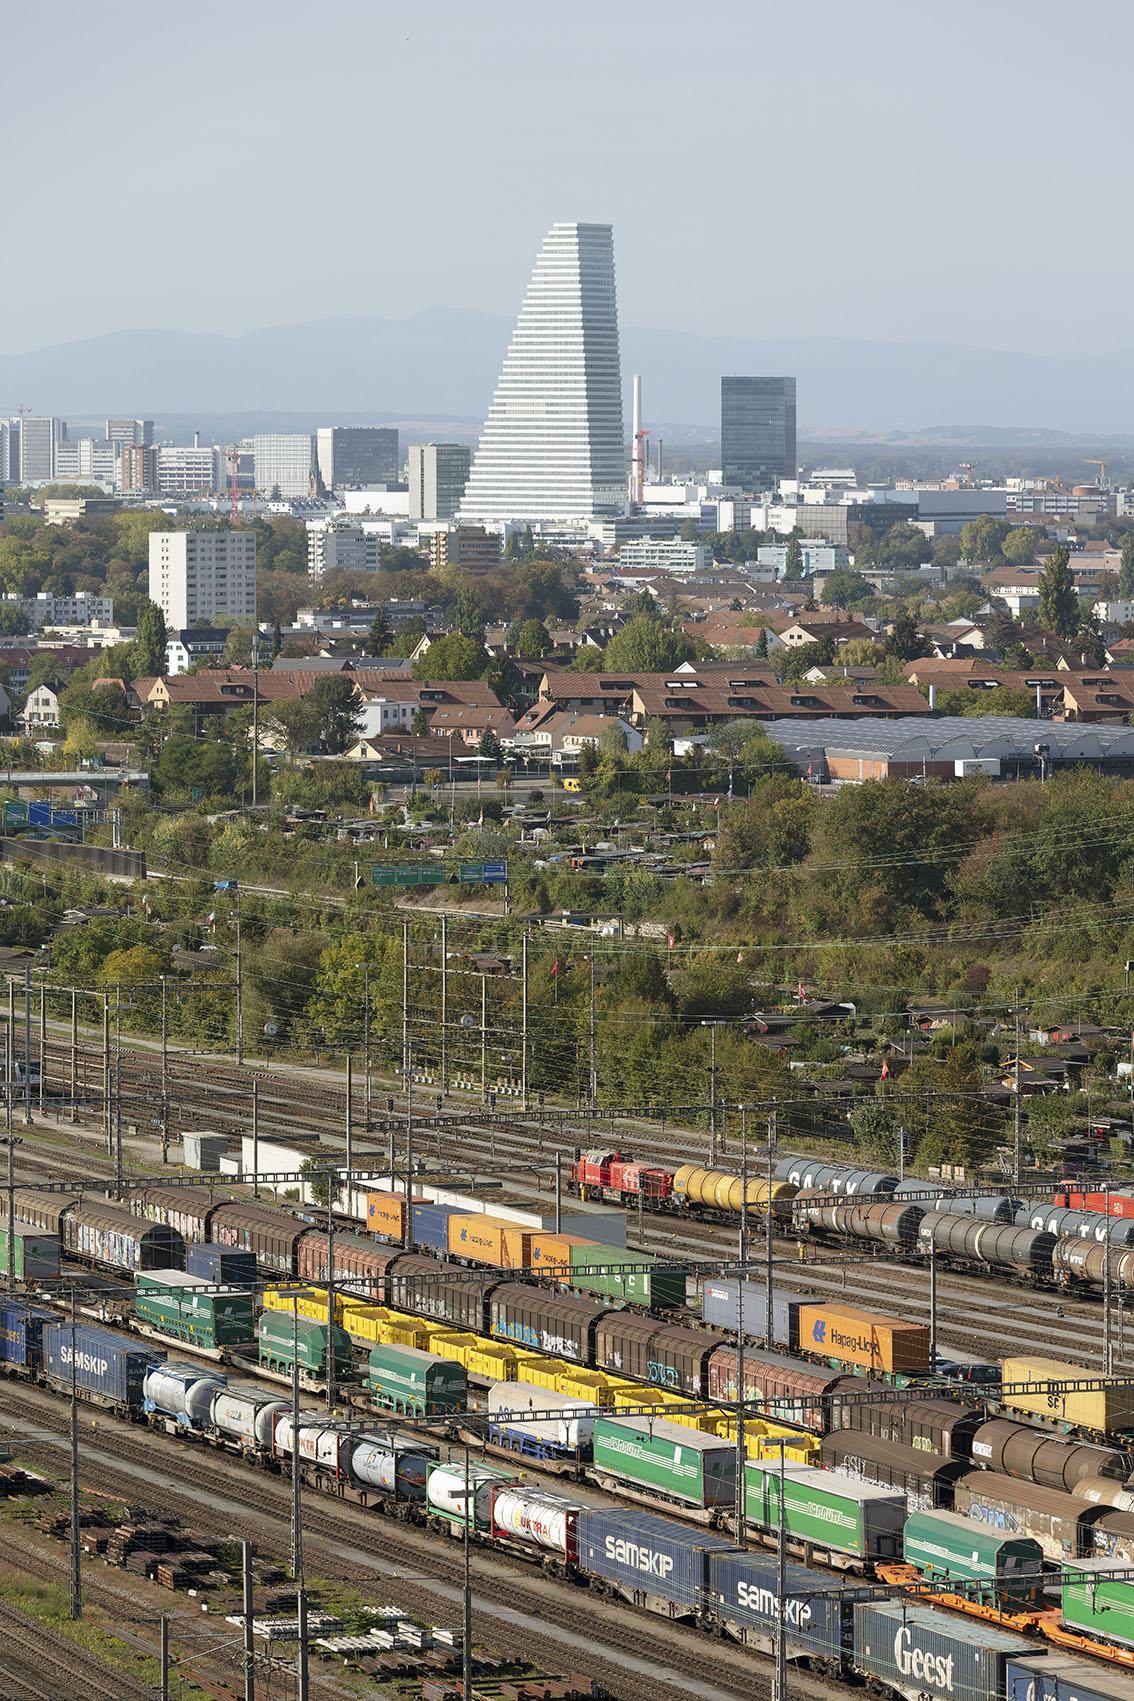 Roche / building 1 - Basel